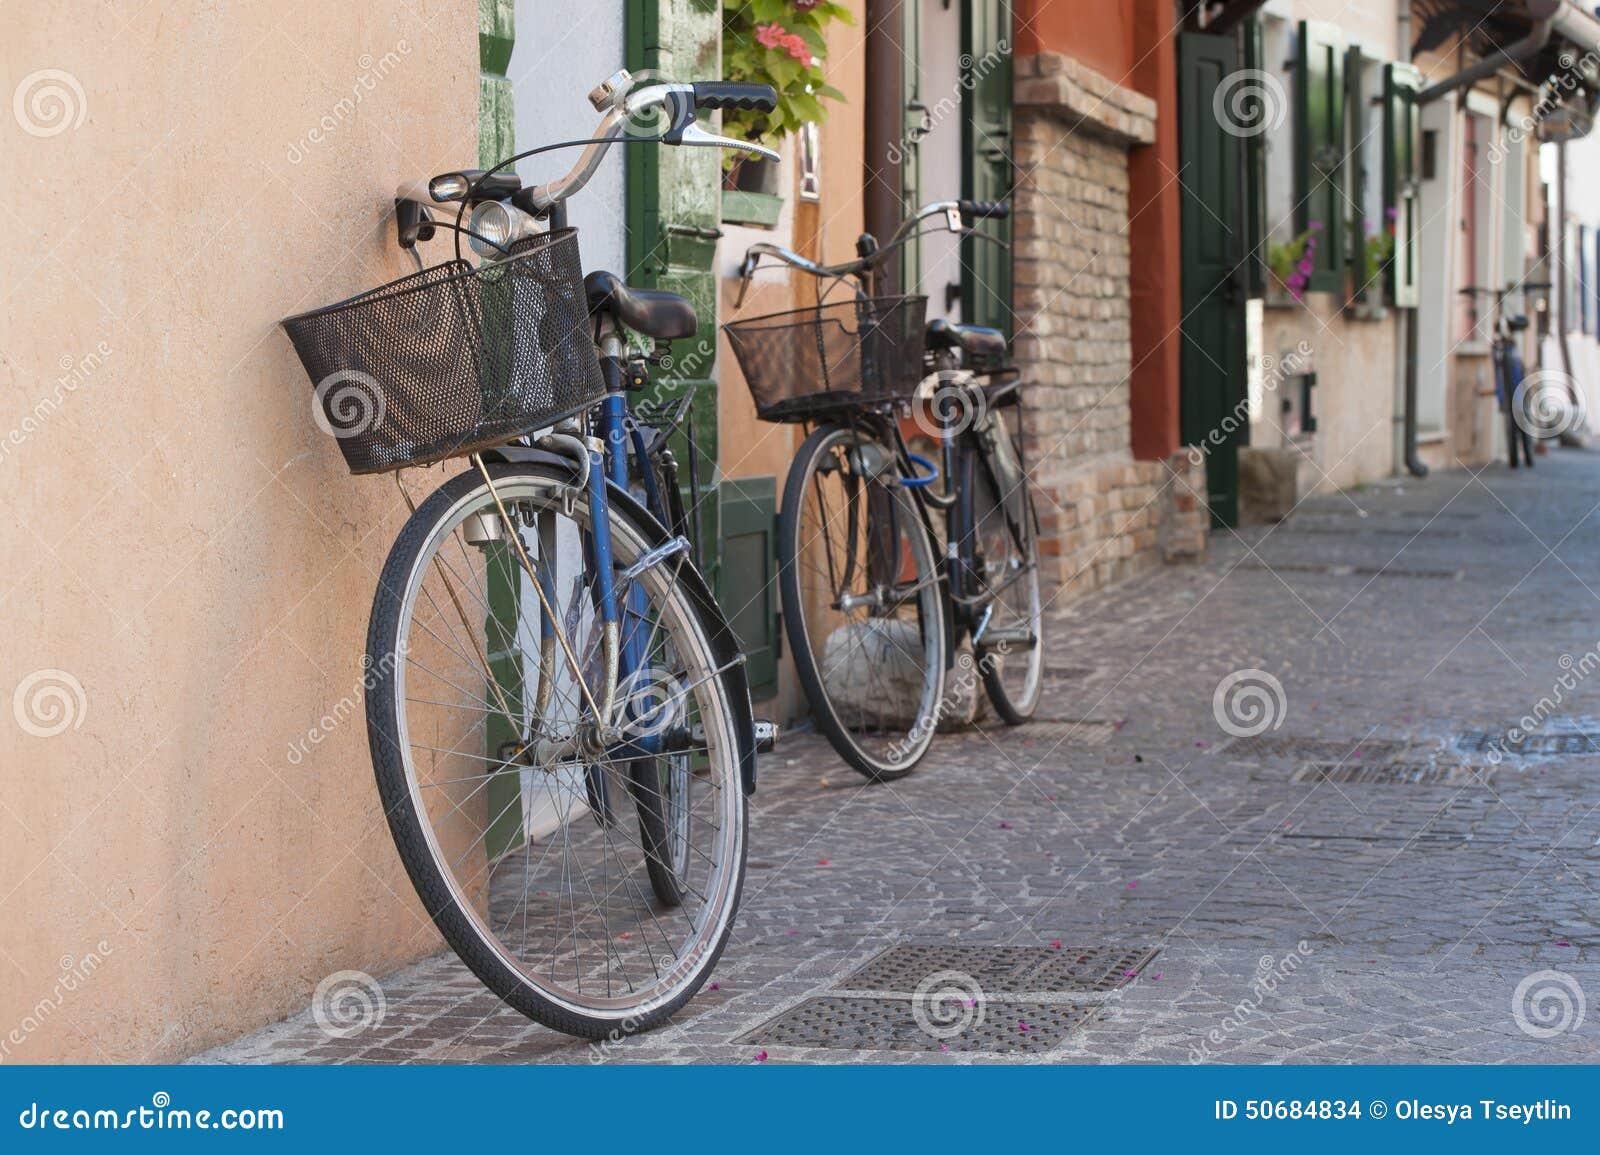 Download 在意大利街道上的自行车 库存照片. 图片 包括有 颜色, 街道, 五颜六色, 乐趣, 骑自行车的人, 生态 - 50684834